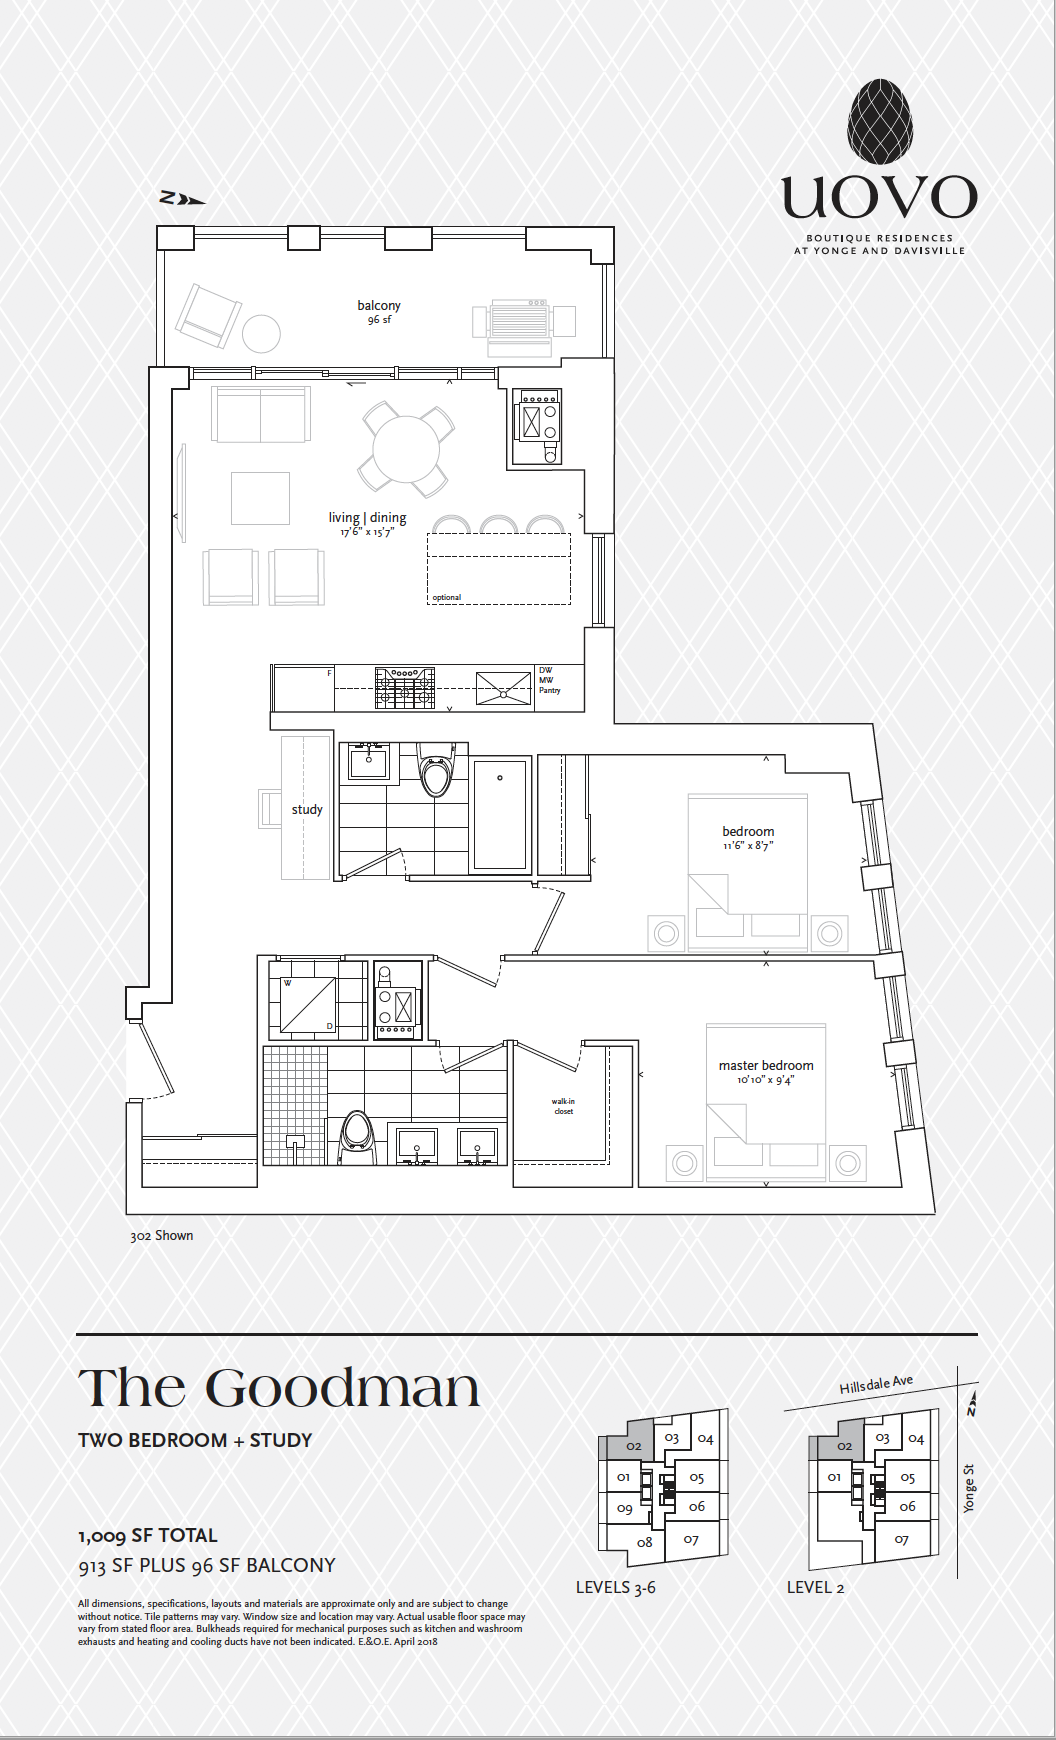 The Goodman - Uovo Residences